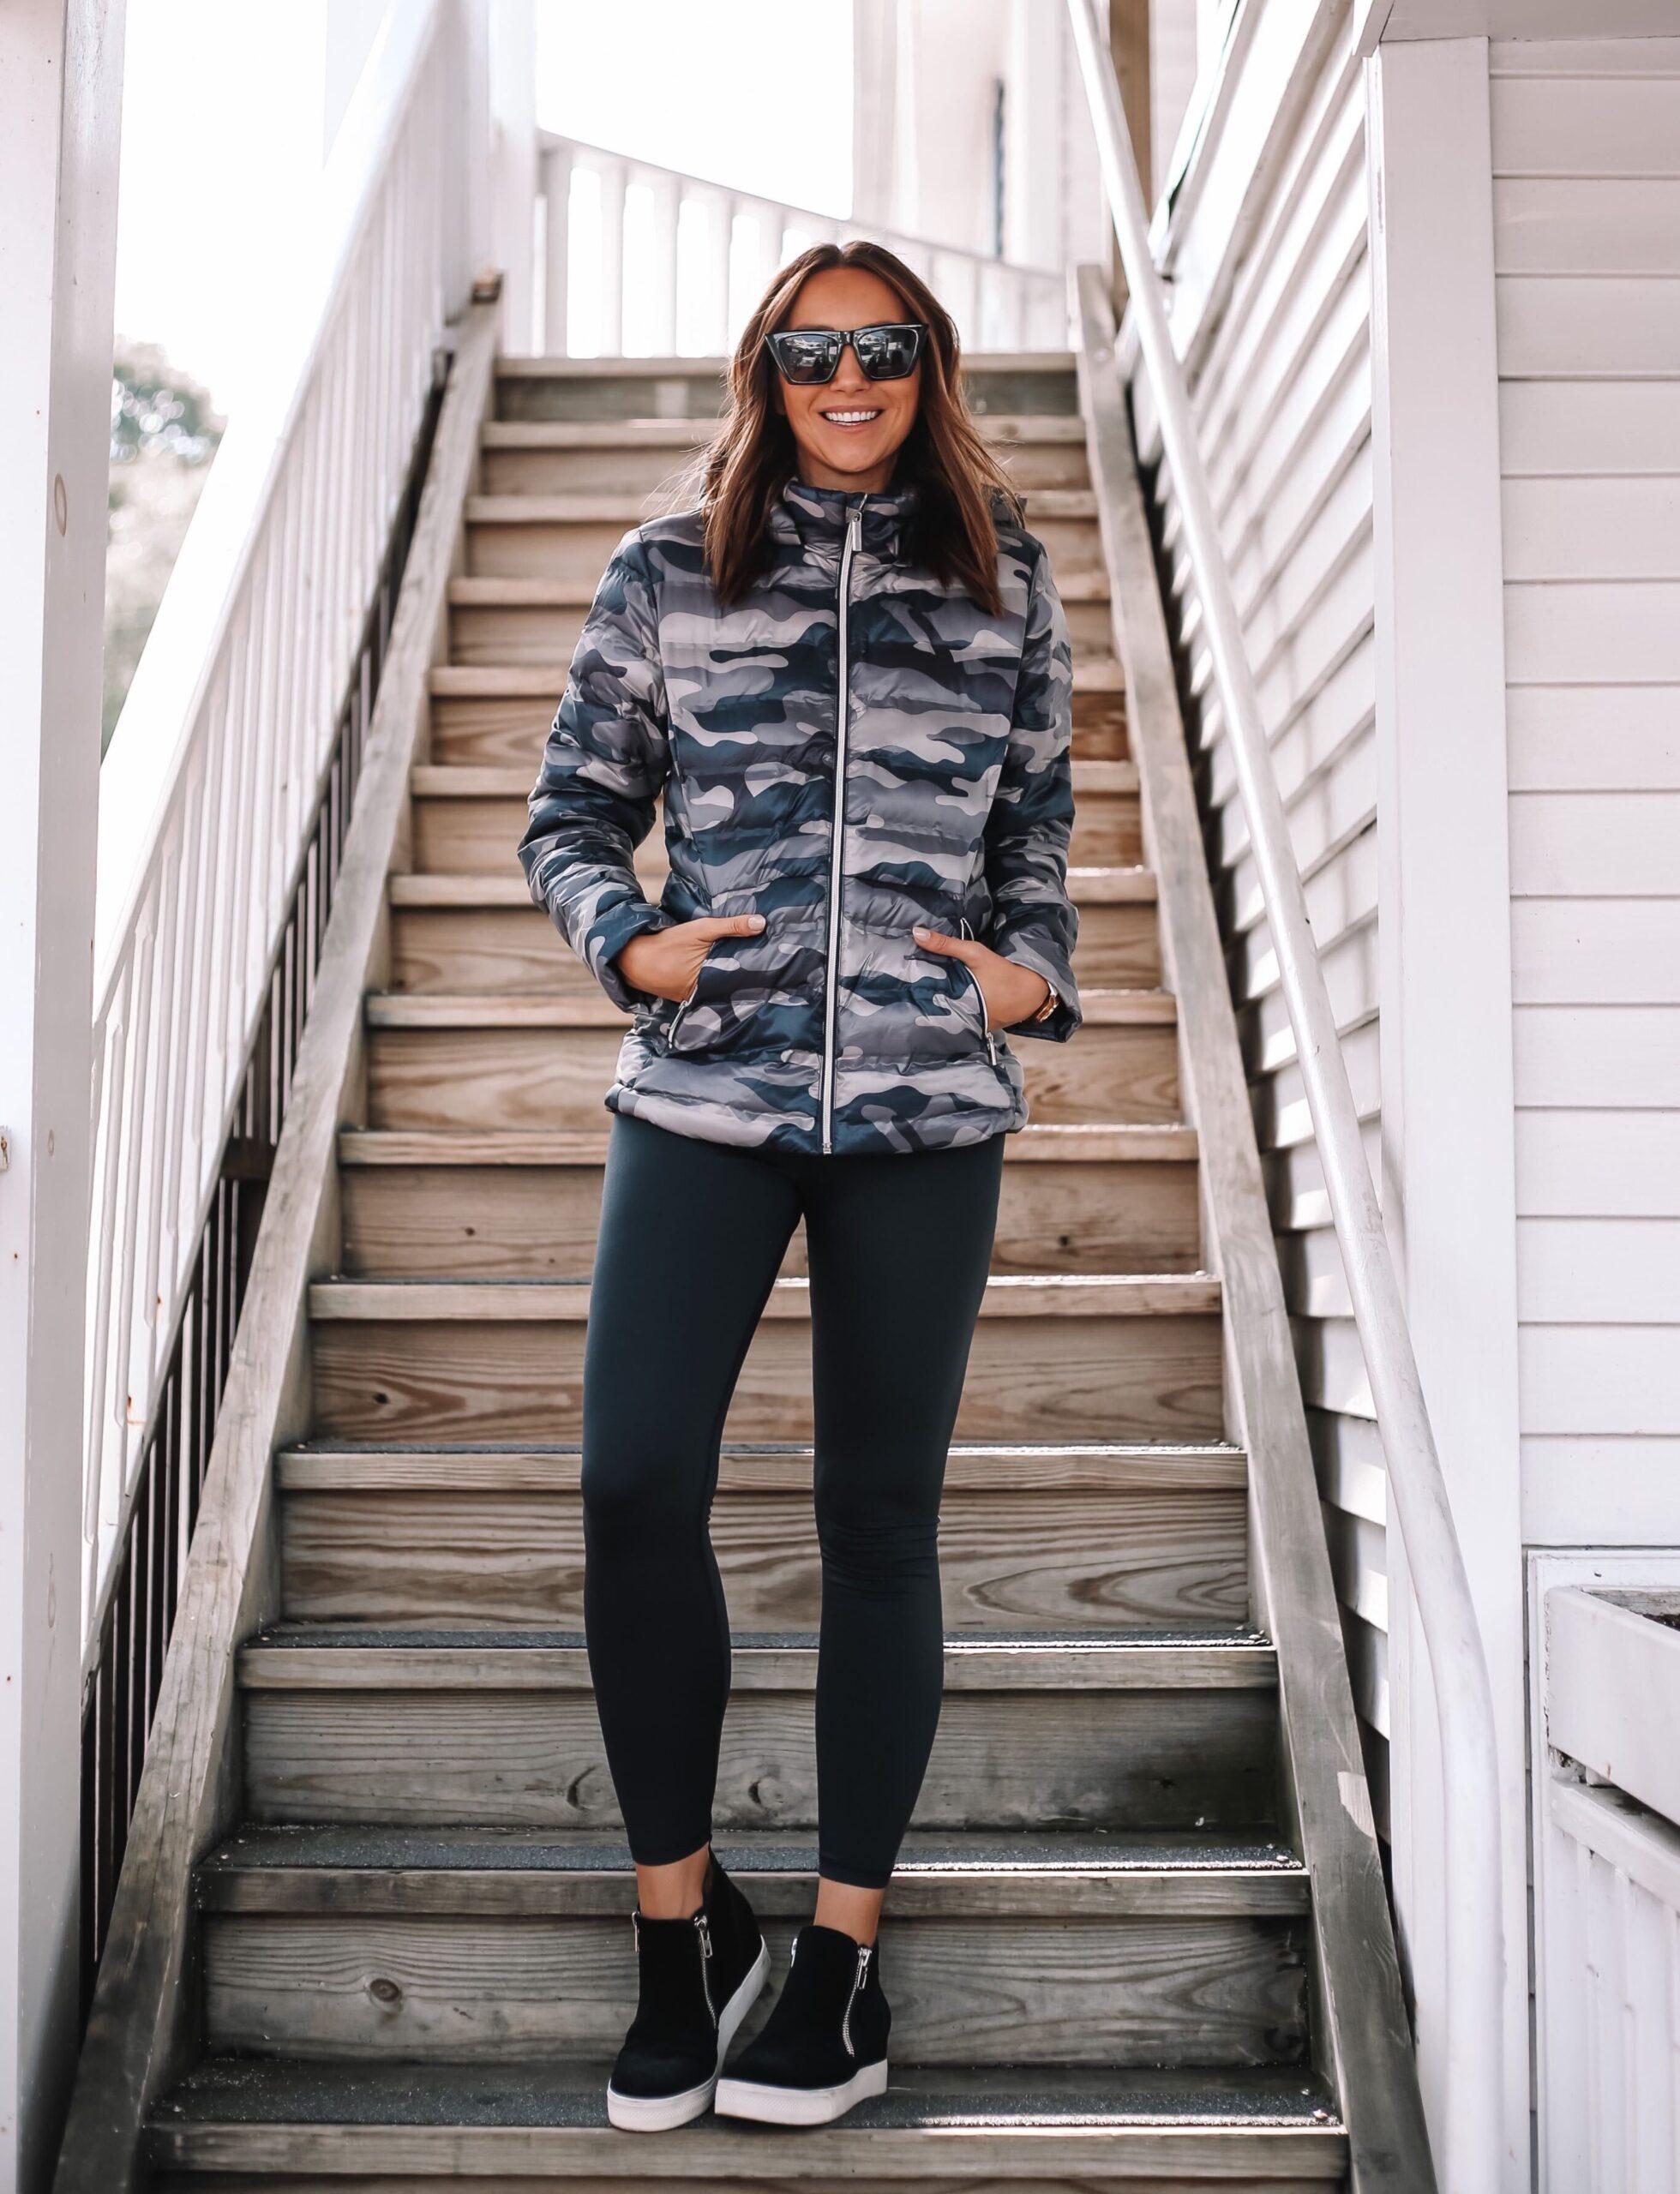 walmart camo puffer jacket, fall outfit idea, fall jacket